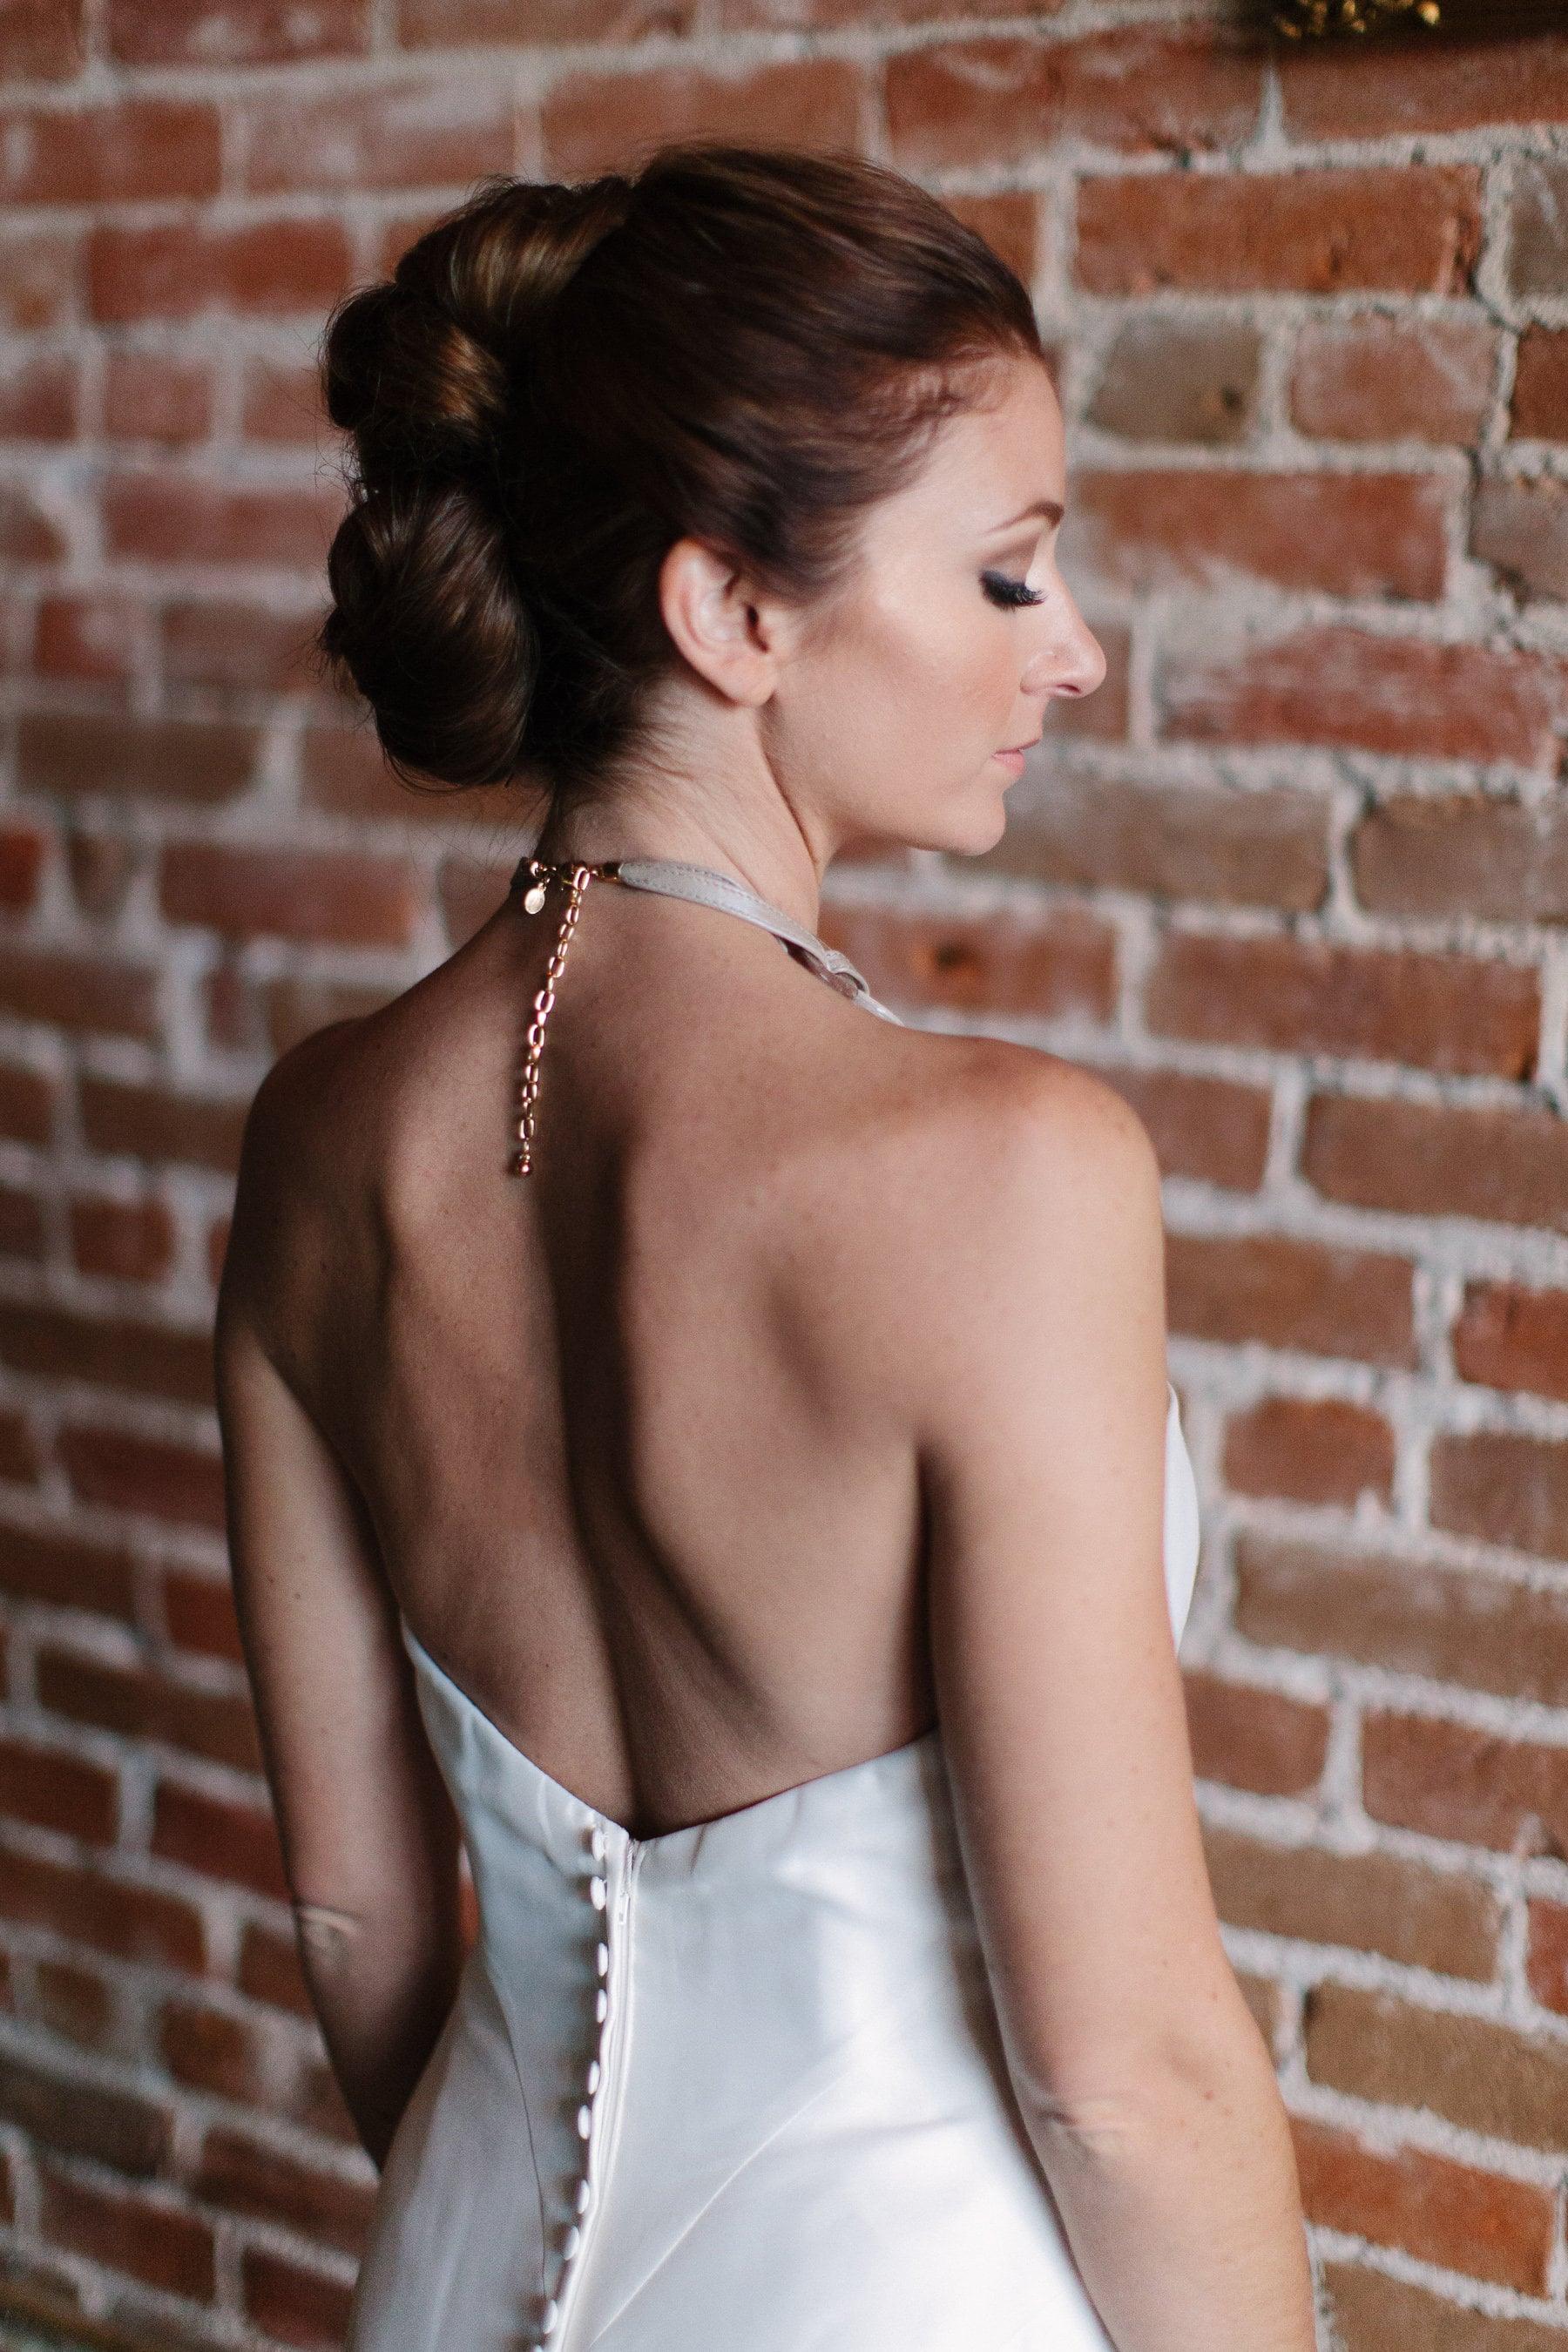 Shawna Hines Hair, Radion Photography